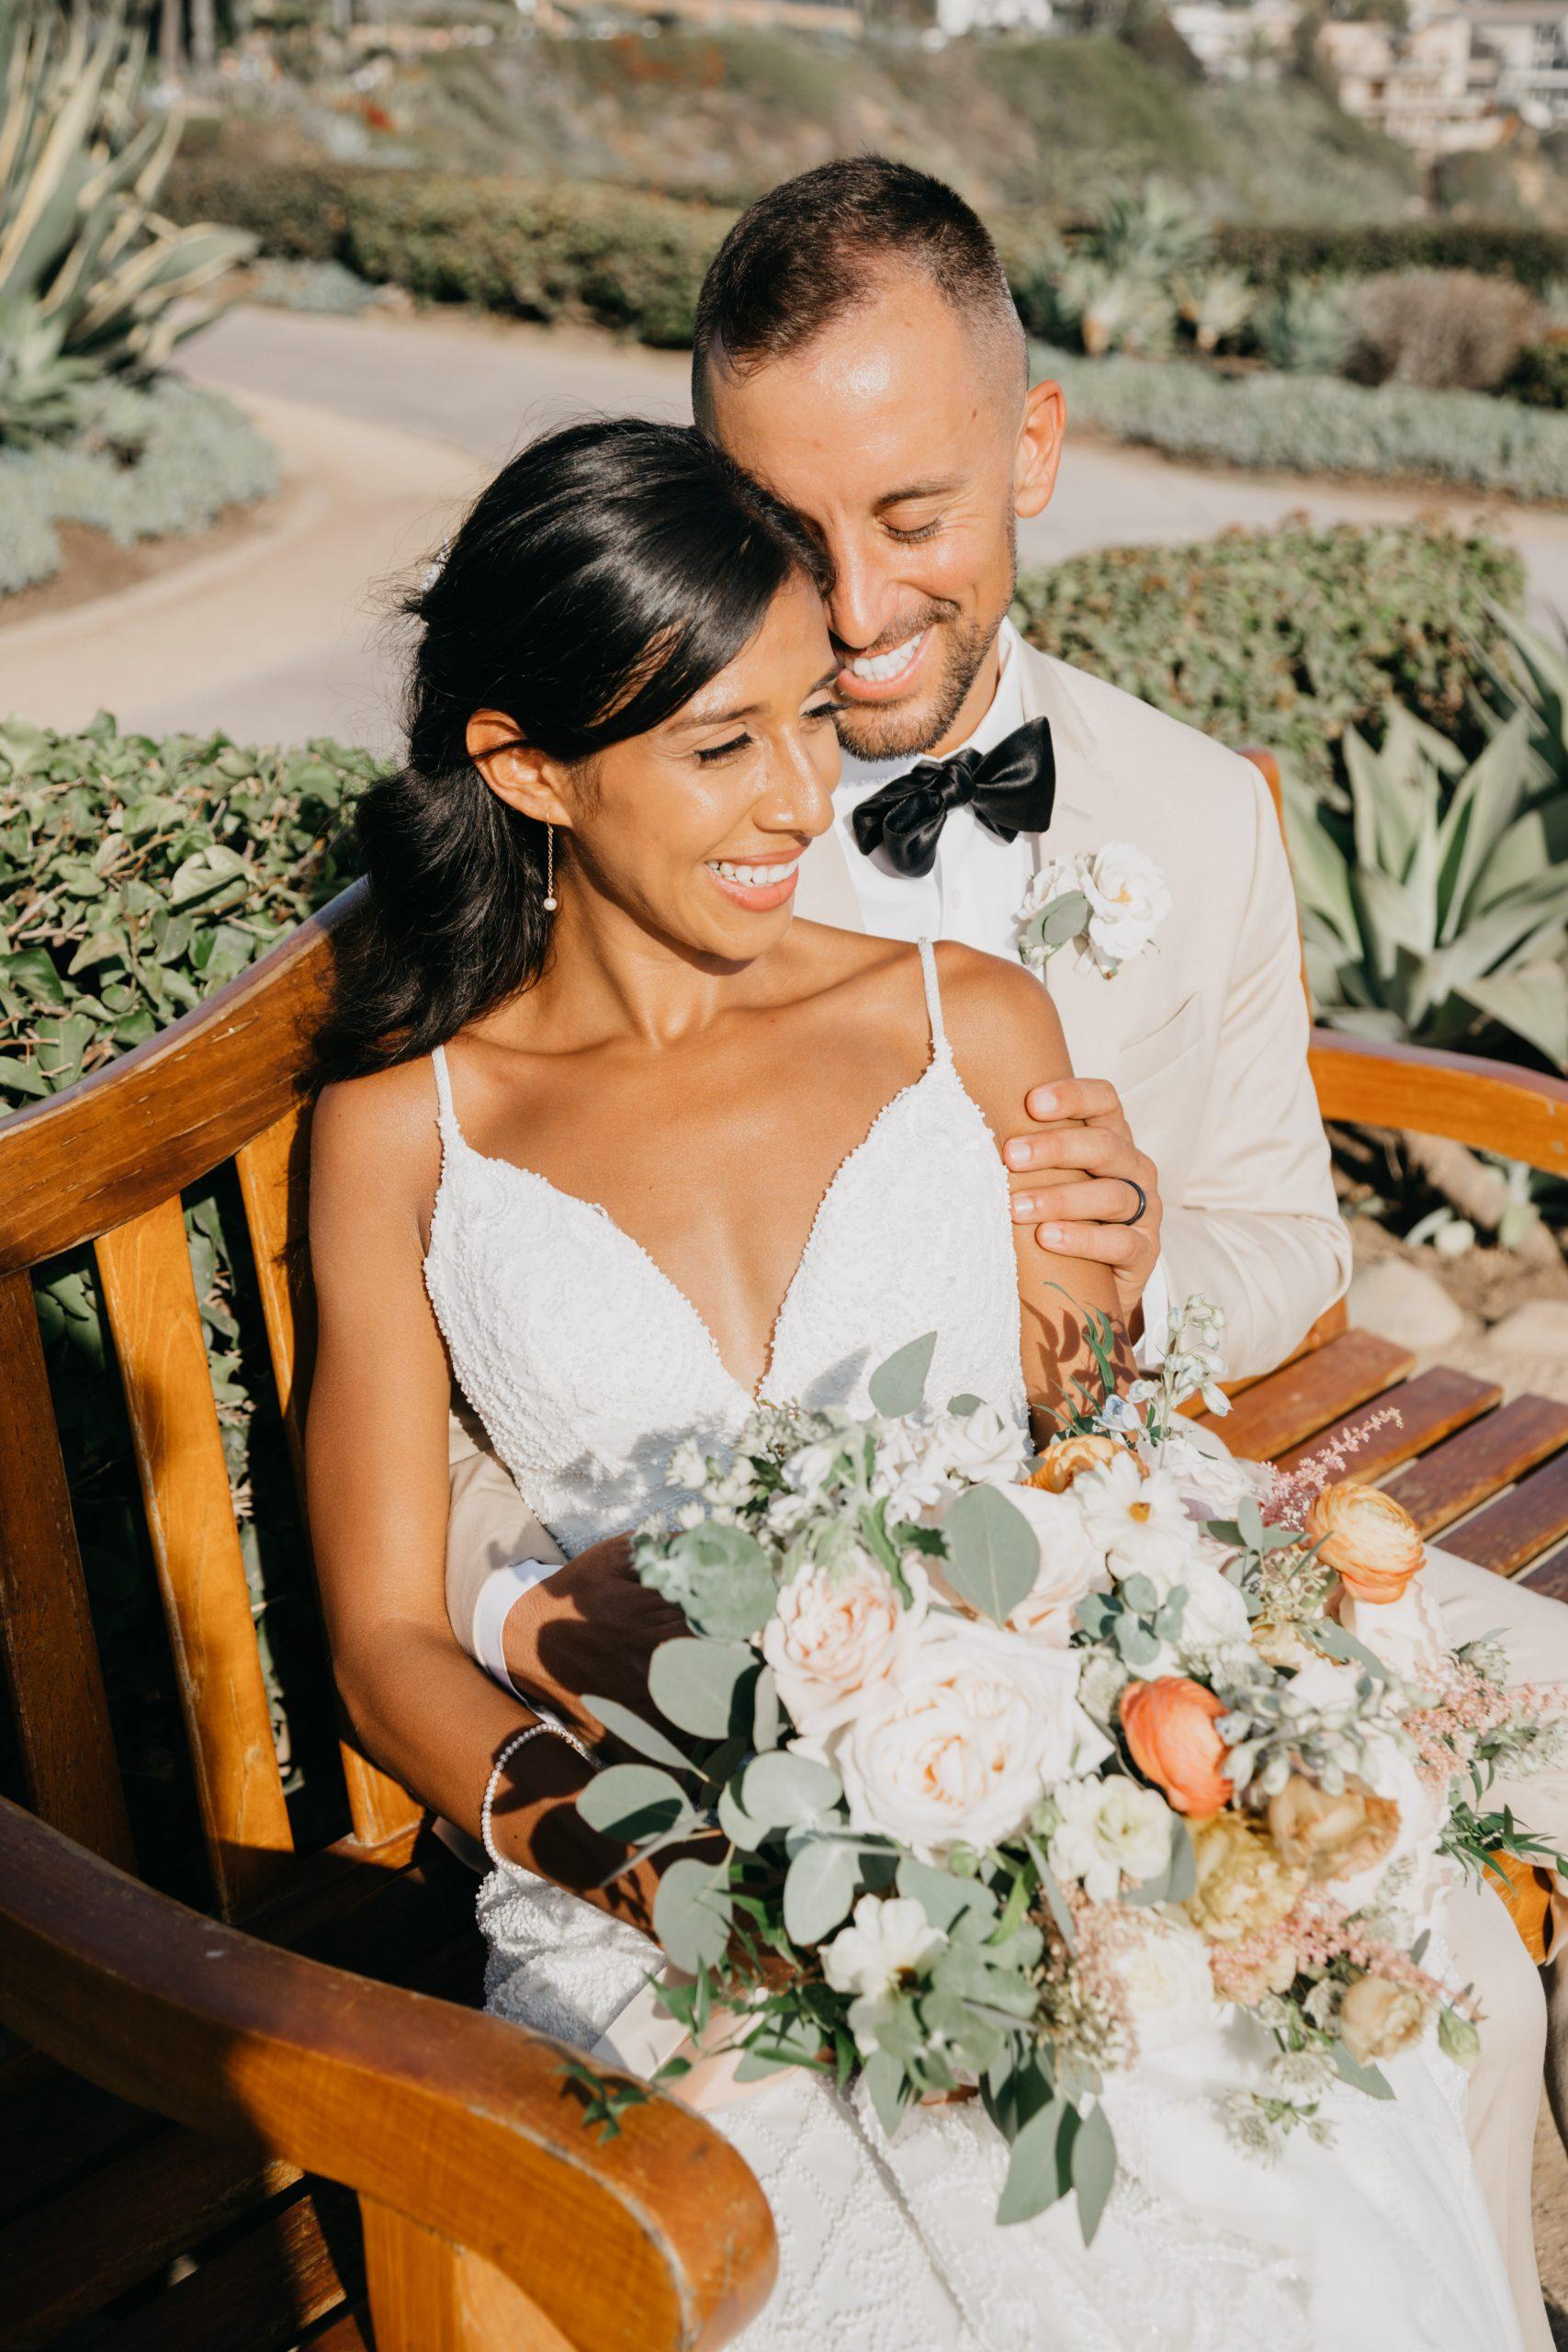 Bridal Portraits at Laguna Beach, image by Fatima Elreda Photo